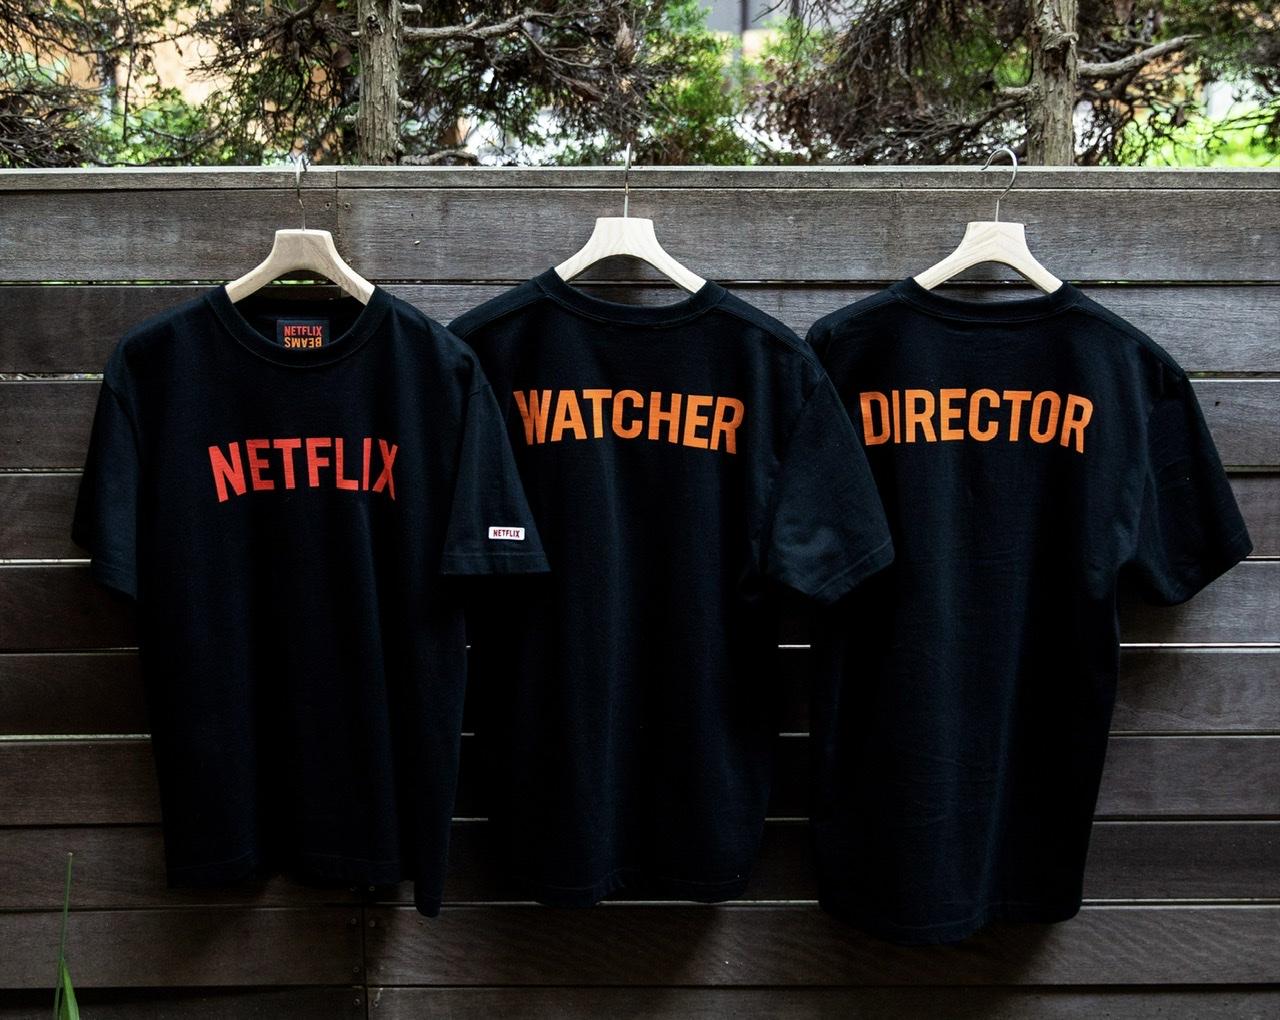 Netflix × BEAMS STAFF T-SHIRT